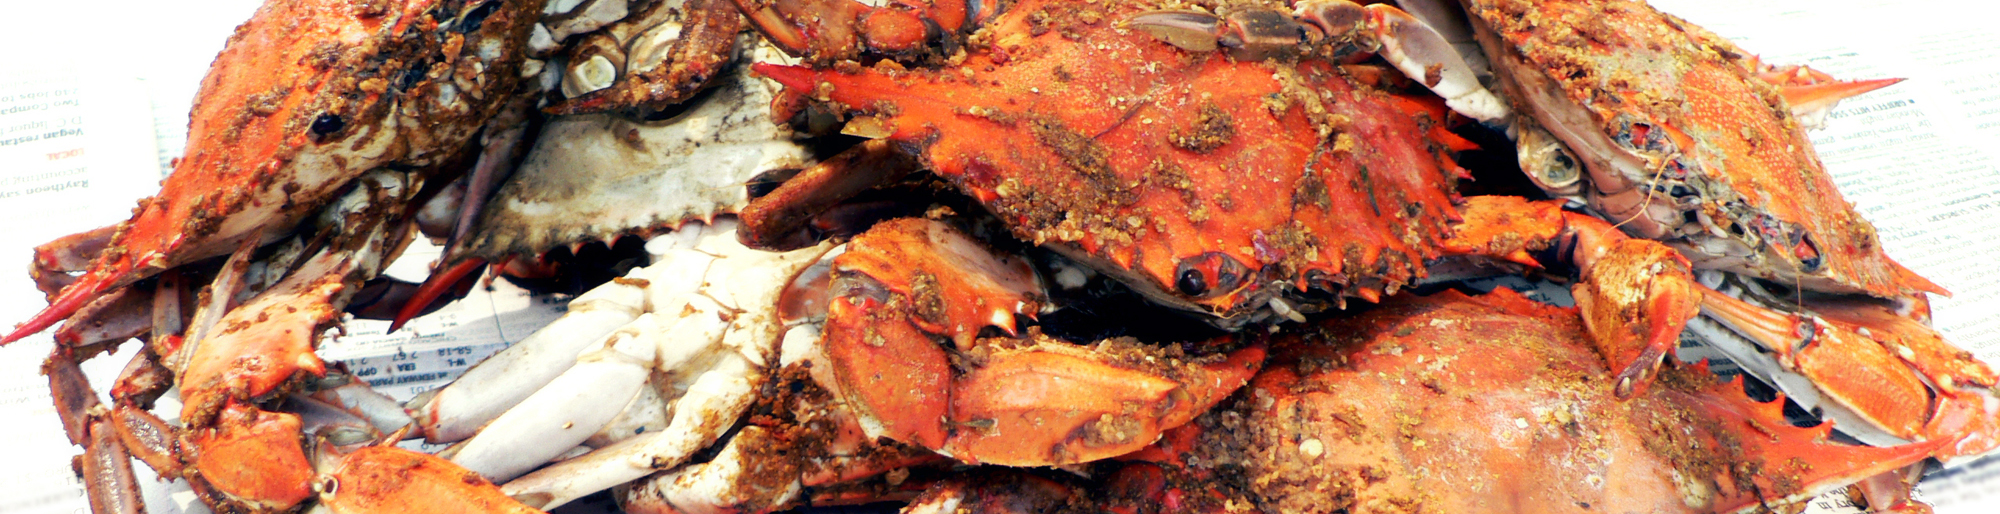 Hard Shell Crabs